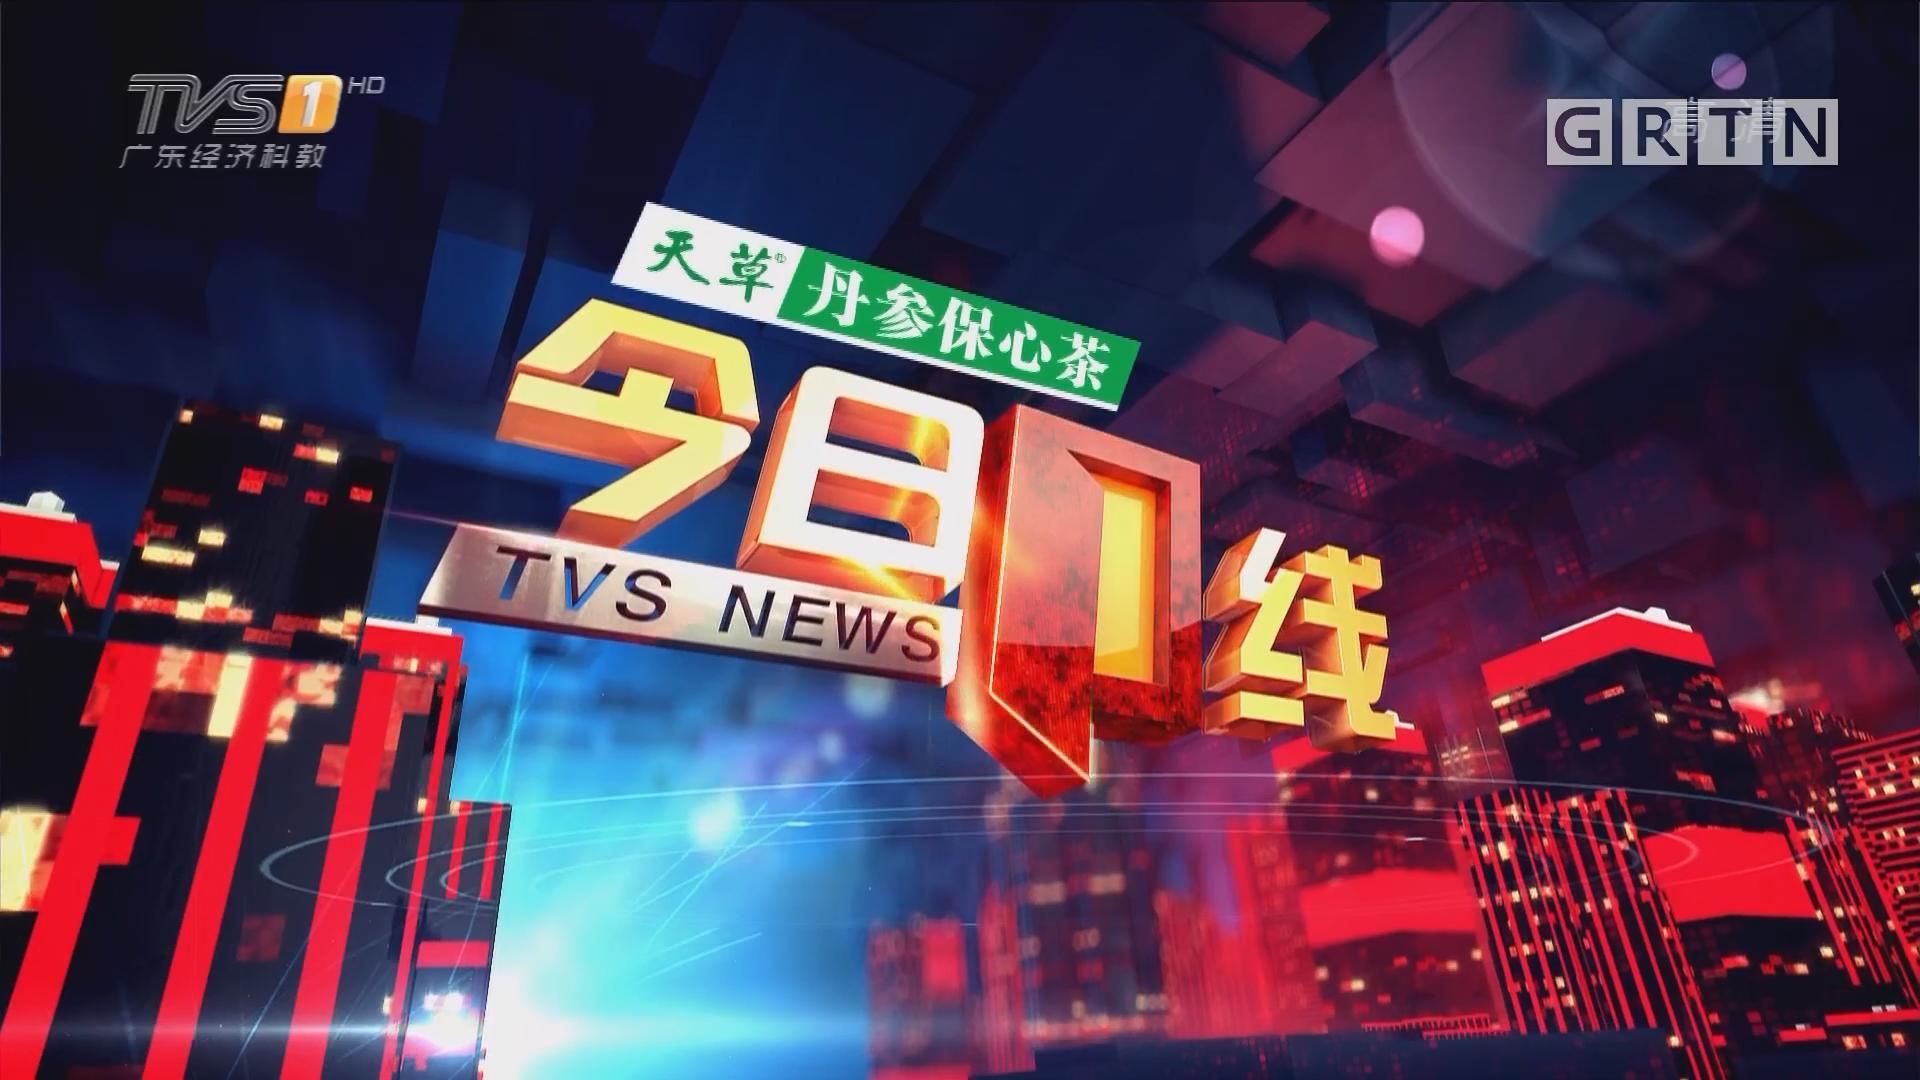 [HD][2018-08-12]今日一线:关注台风天气:云浮罗定 十年一遇洪水冲垮老桥 救灾复产有序进行